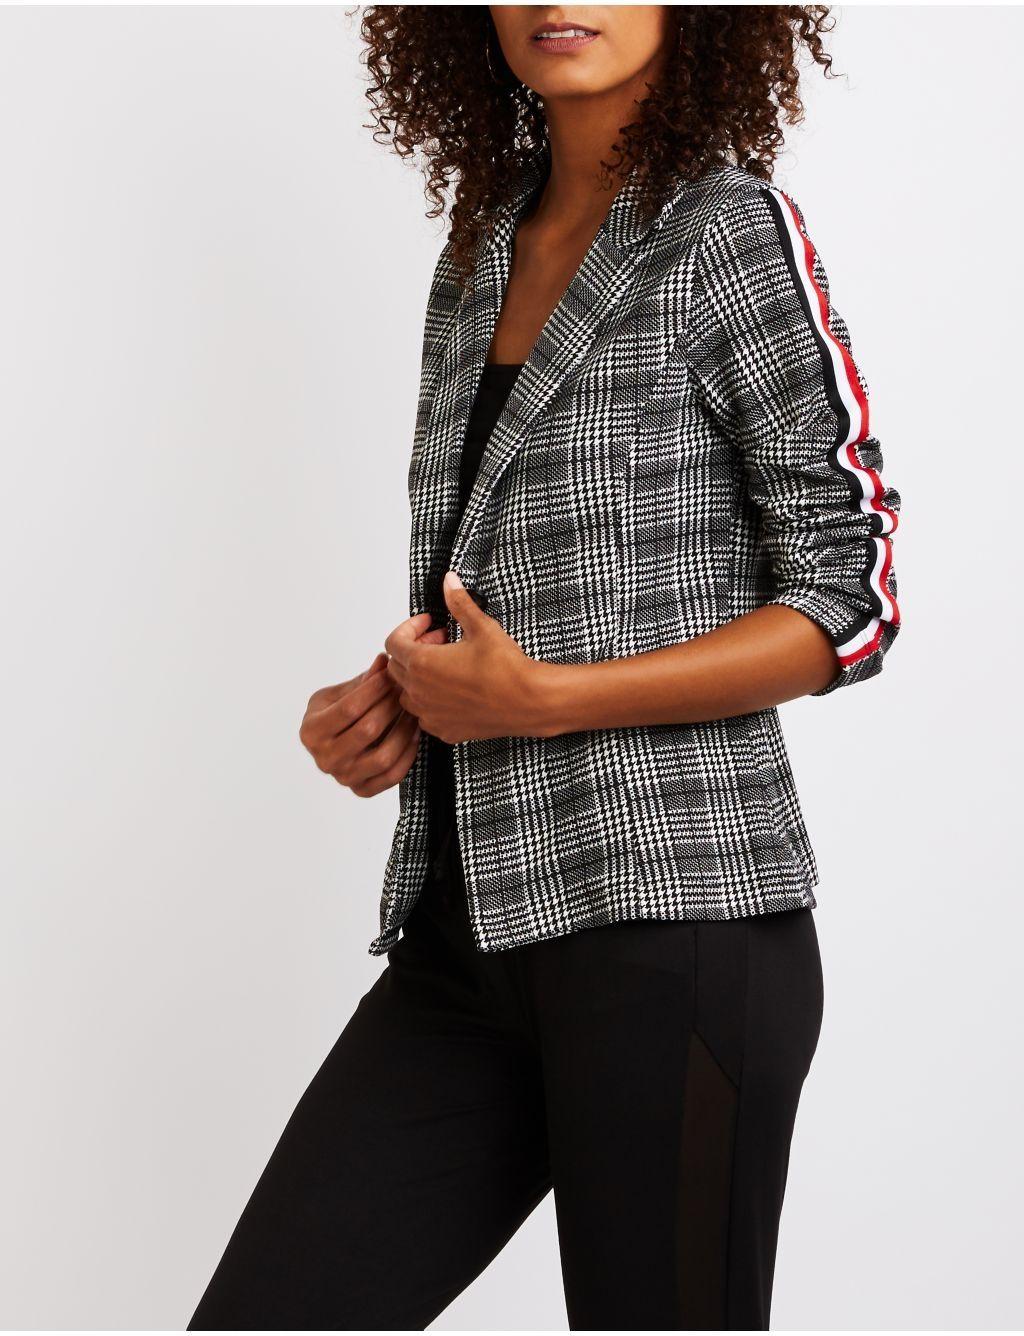 125d4ed257e Buy Charlotte Russe Plaid Striped Sleeve Blazer in Egypt